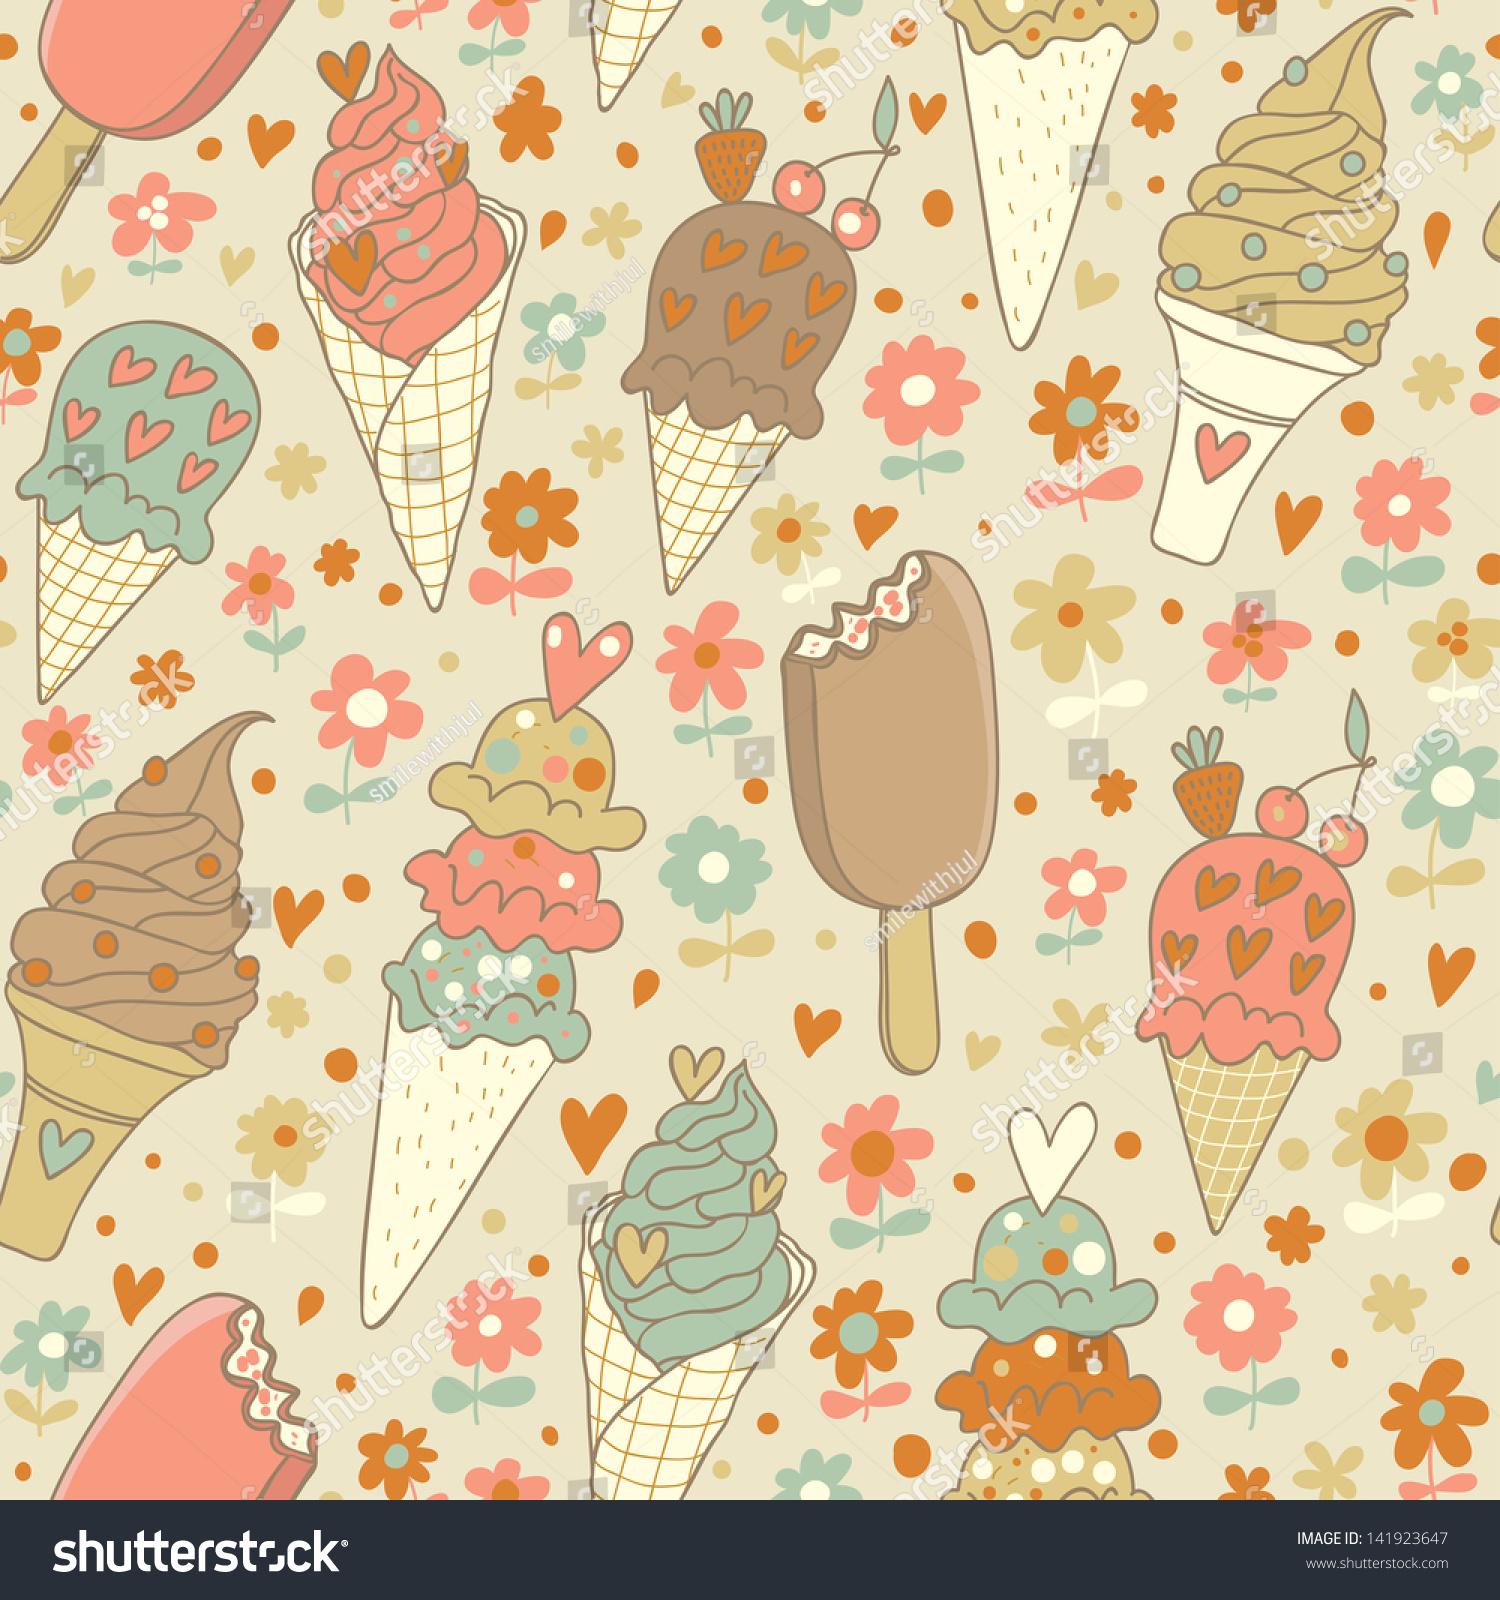 Summer Ice Cream Wallpaper: Cute Vintage Summer Seamless Pattern Tasty Stock Vector